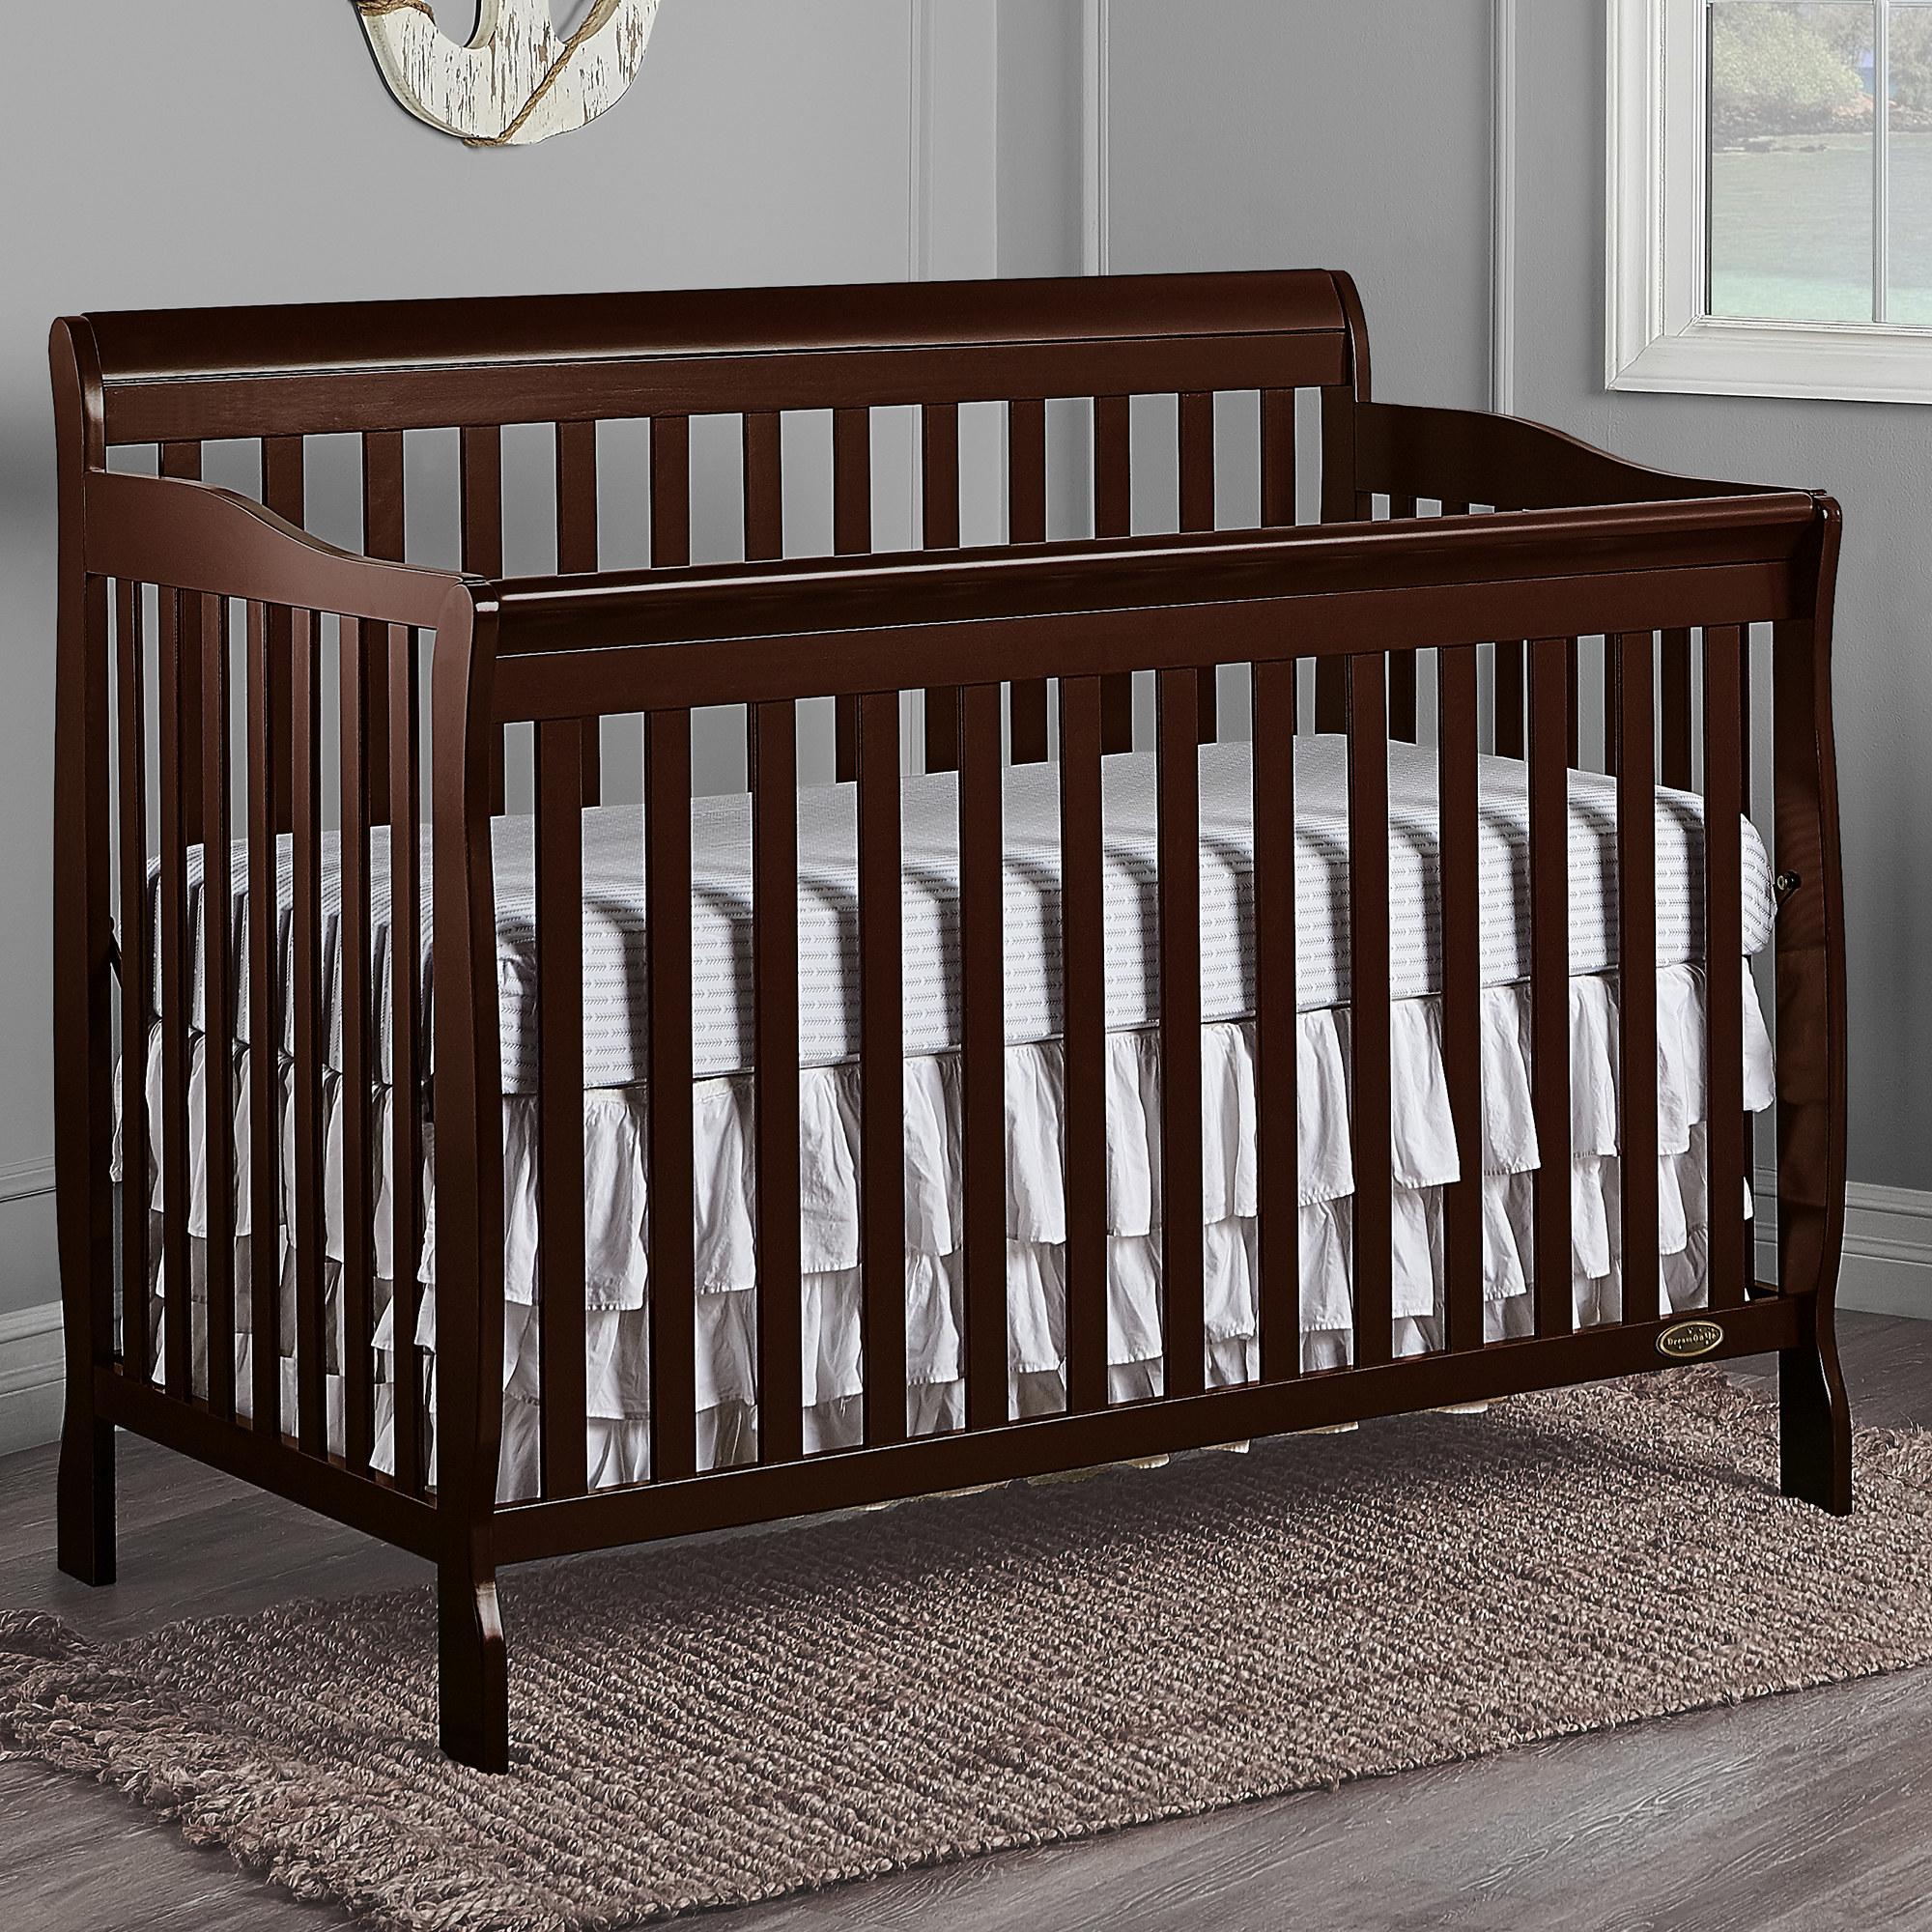 Dark brown convertible crib in a nursery